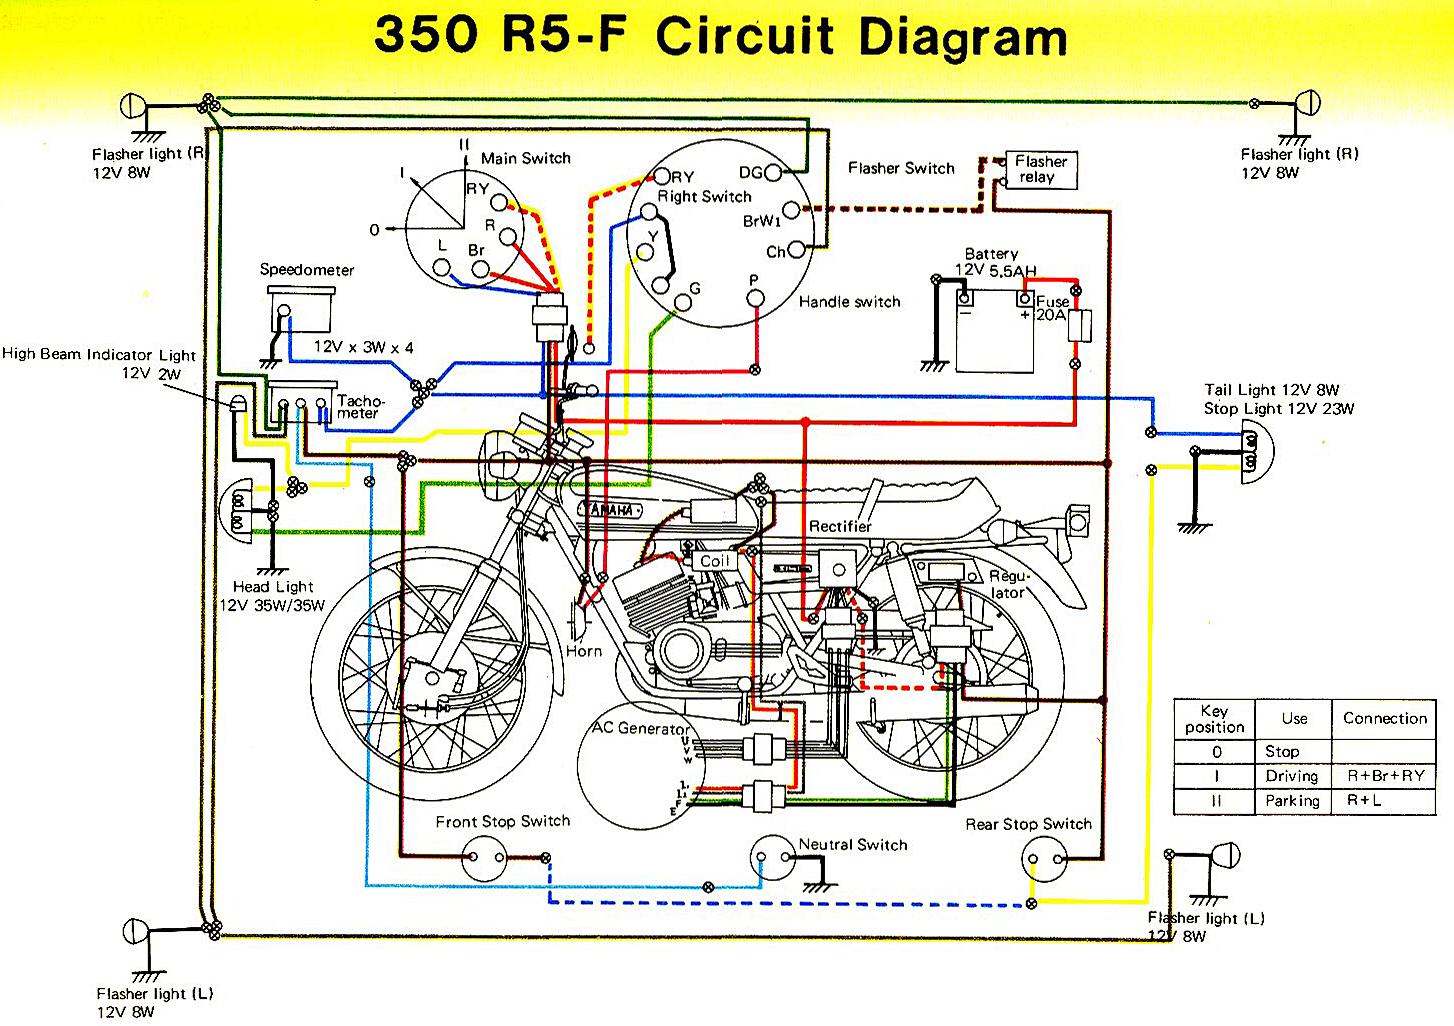 1972 tr6 wiring diagram 948 engine diagram wiring diagram Car Engine Diagram Car Engine Diagram